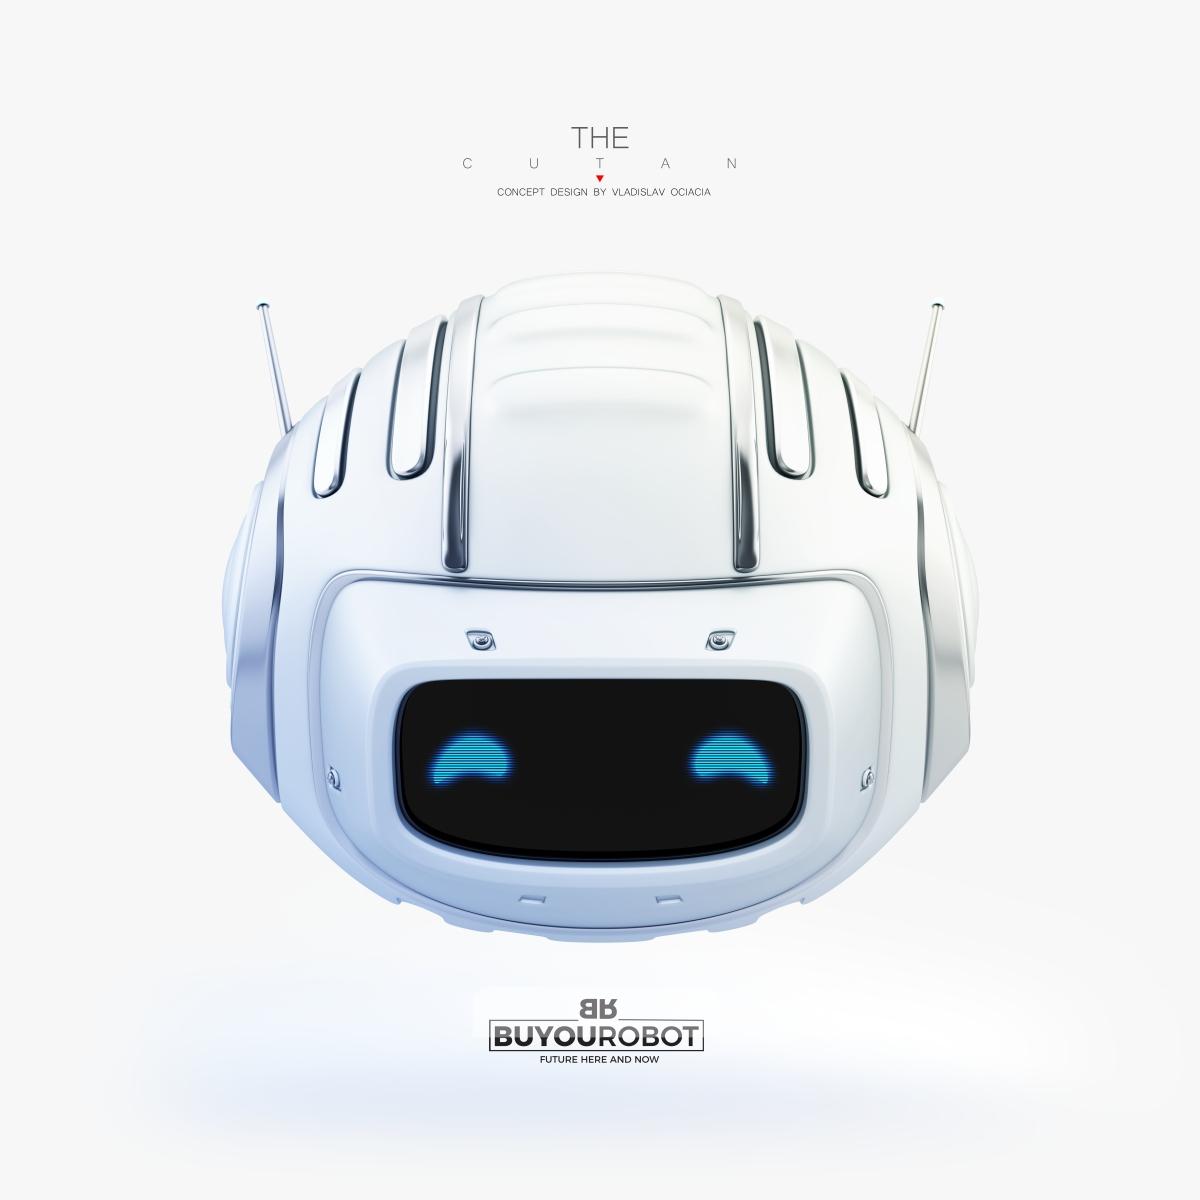 lovely cutan robotic toy 3d model 3dsmax vray fbx